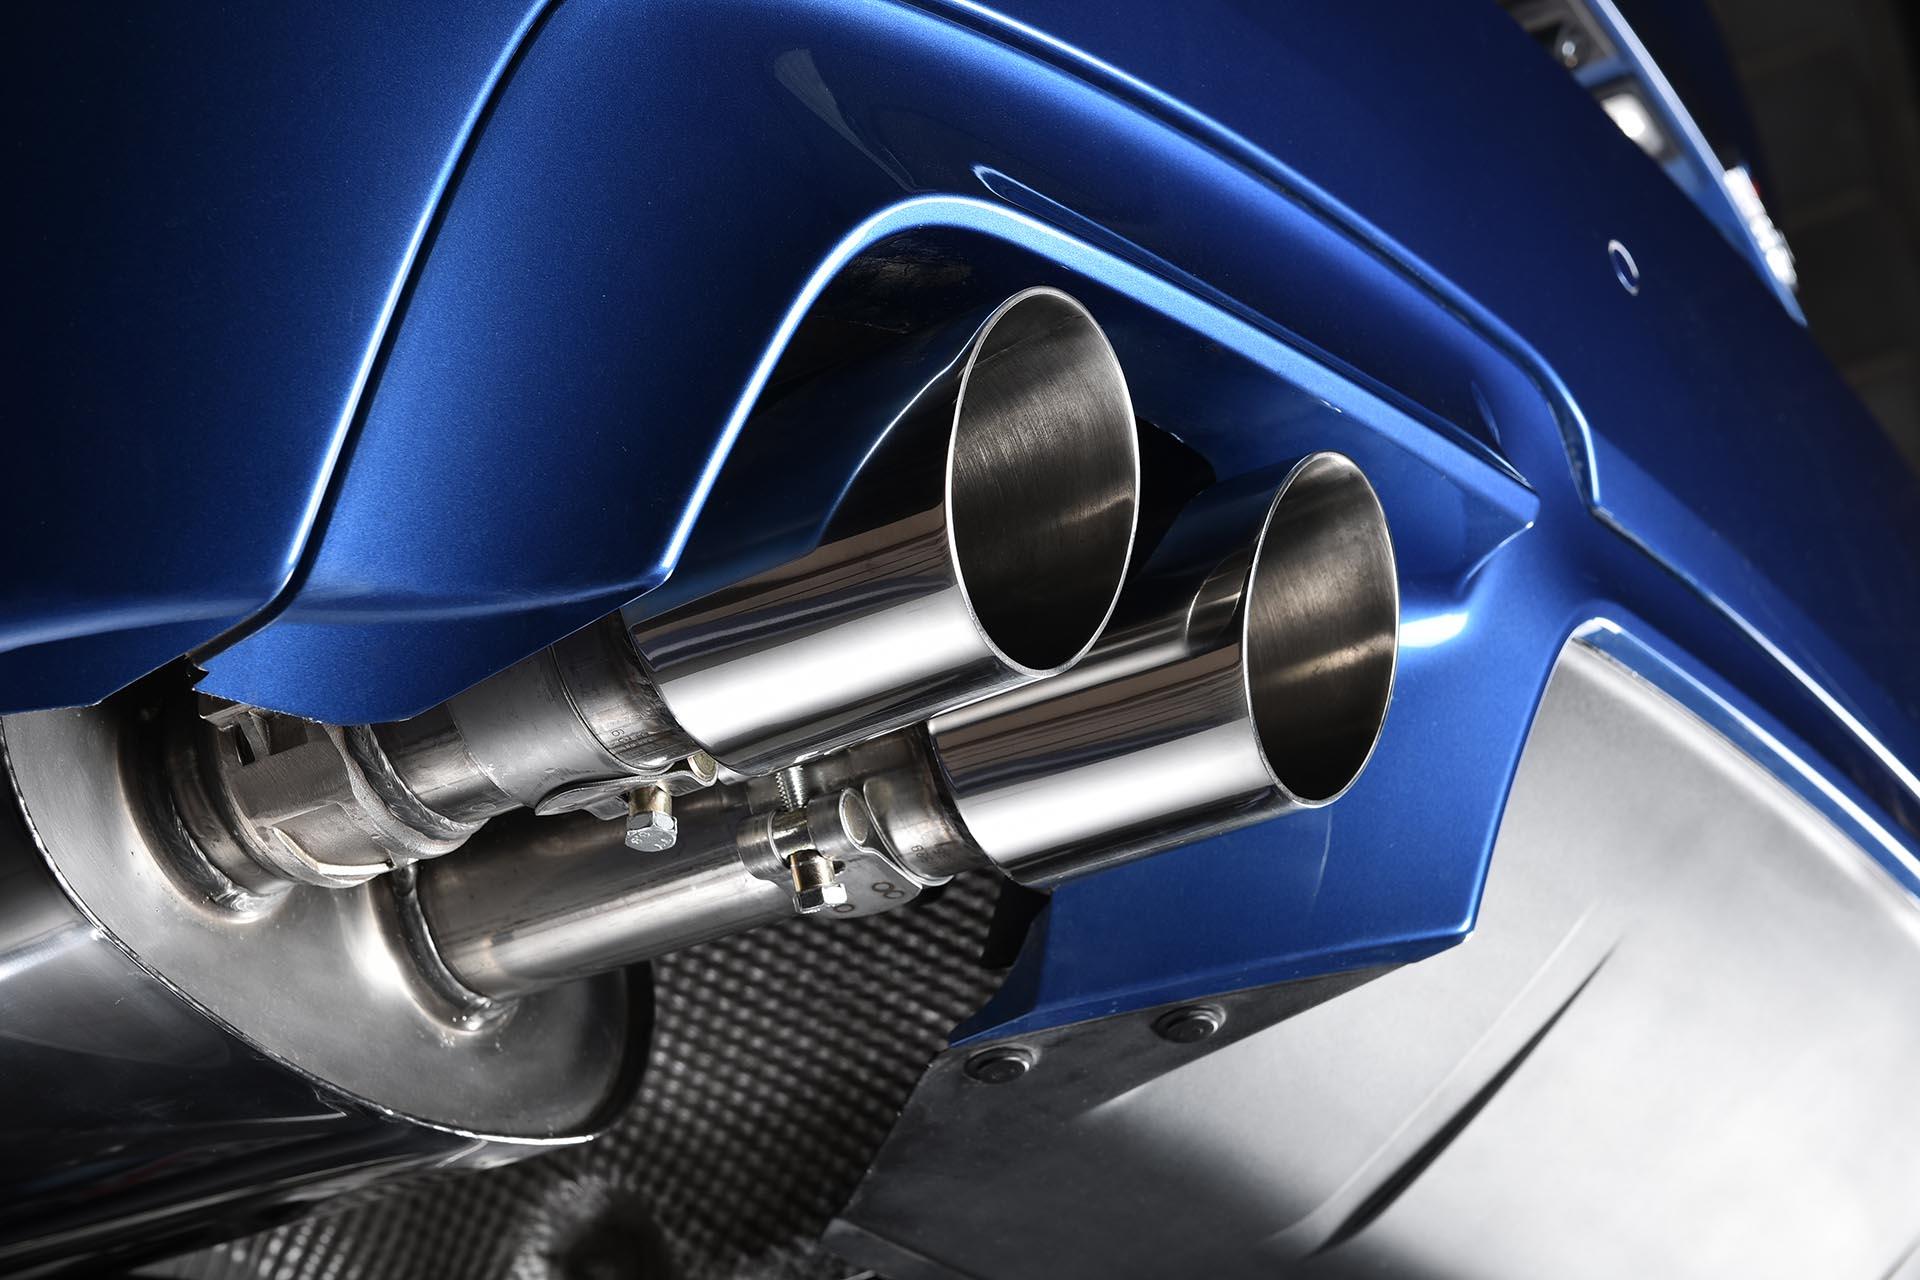 Milltek Cat Back Exhaust System - BMW M5 (F10)